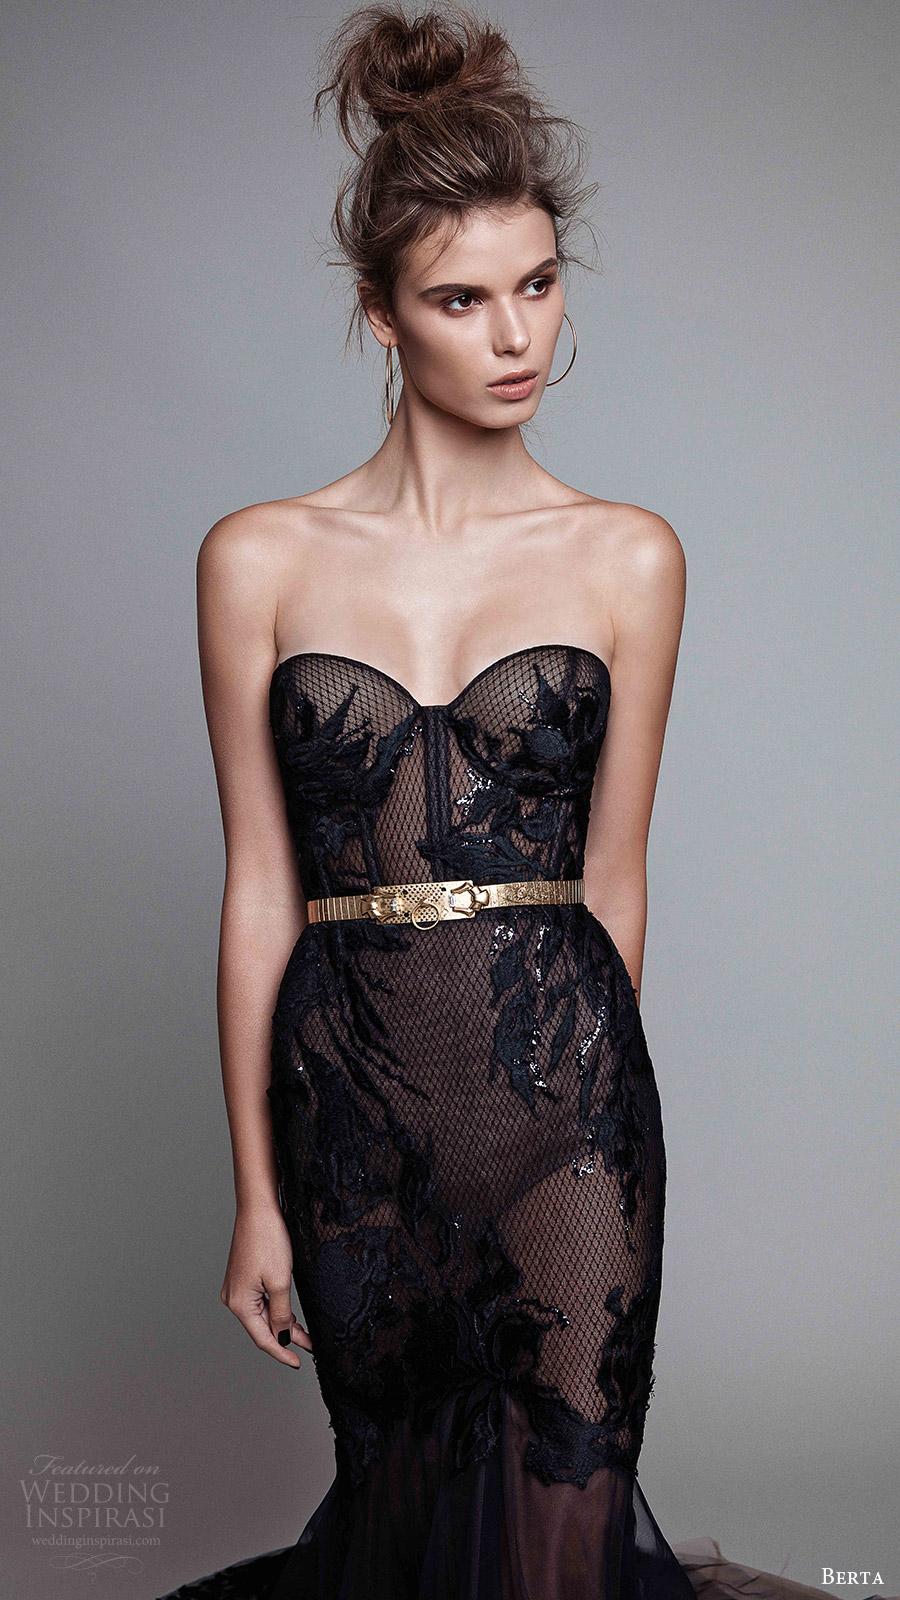 berta rtw fall 2017 (17 23) strapless sweetheart mermaid embellished black evening dress zfv